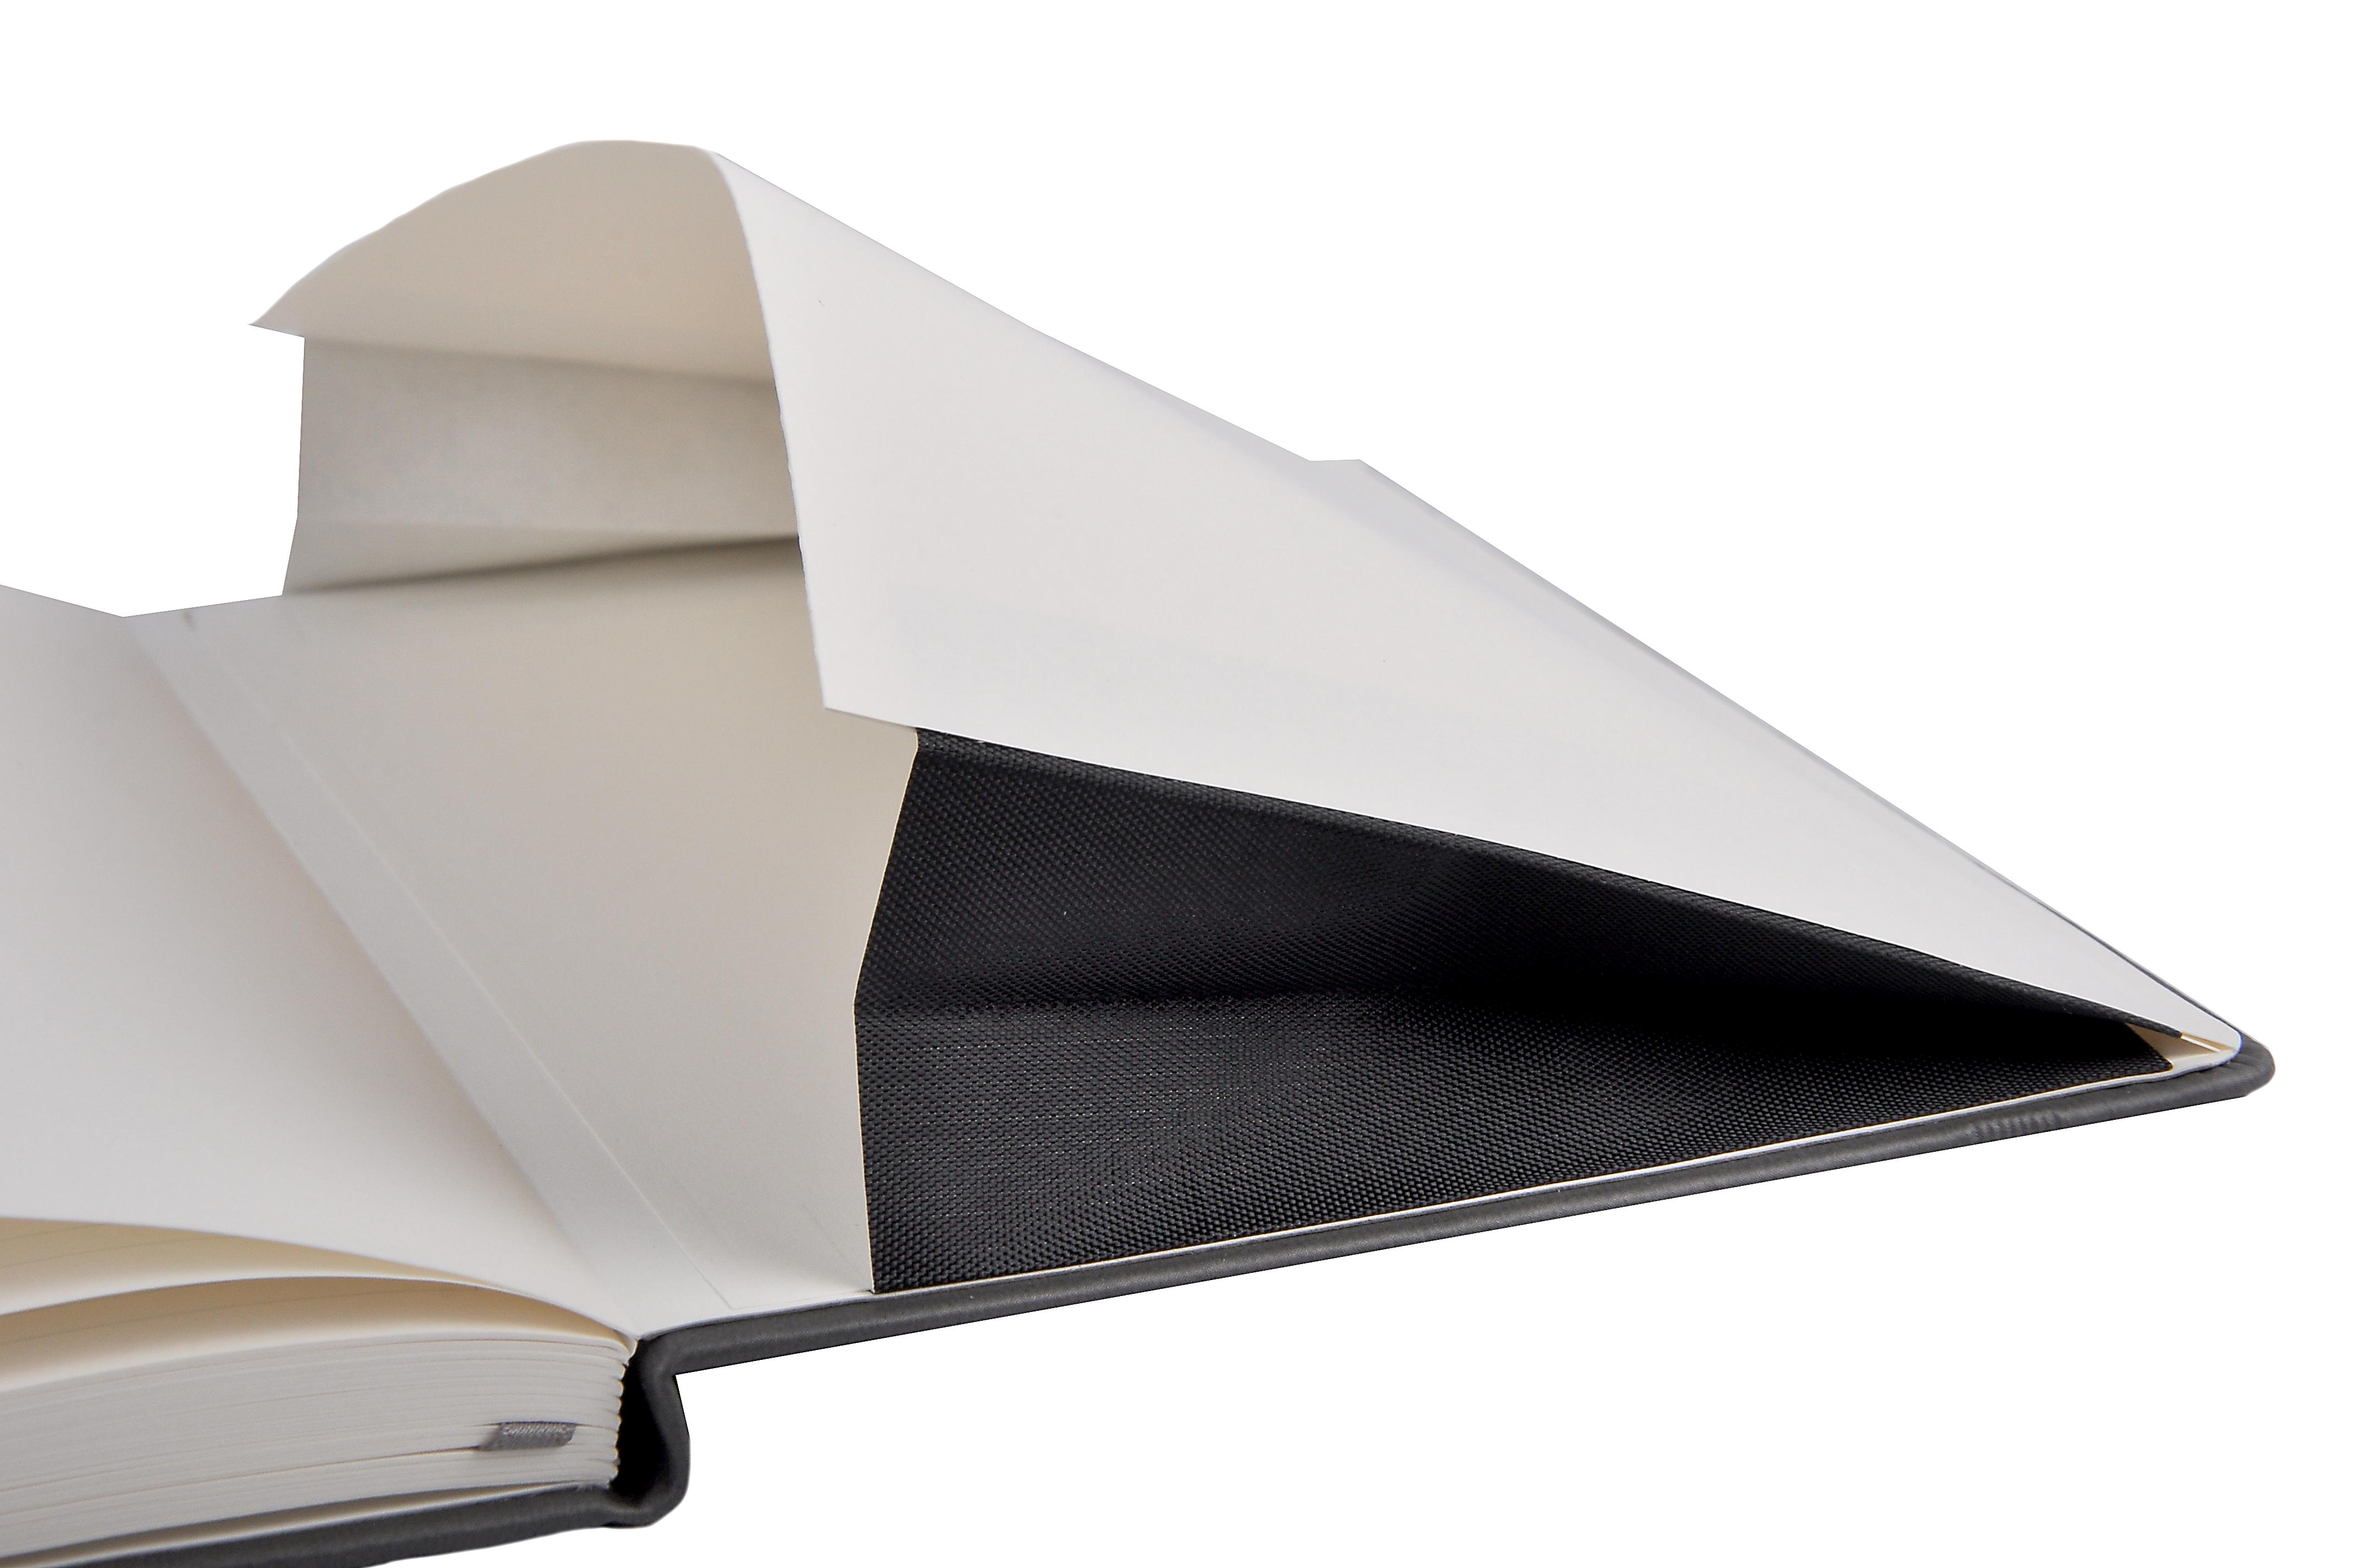 Expandable envelope